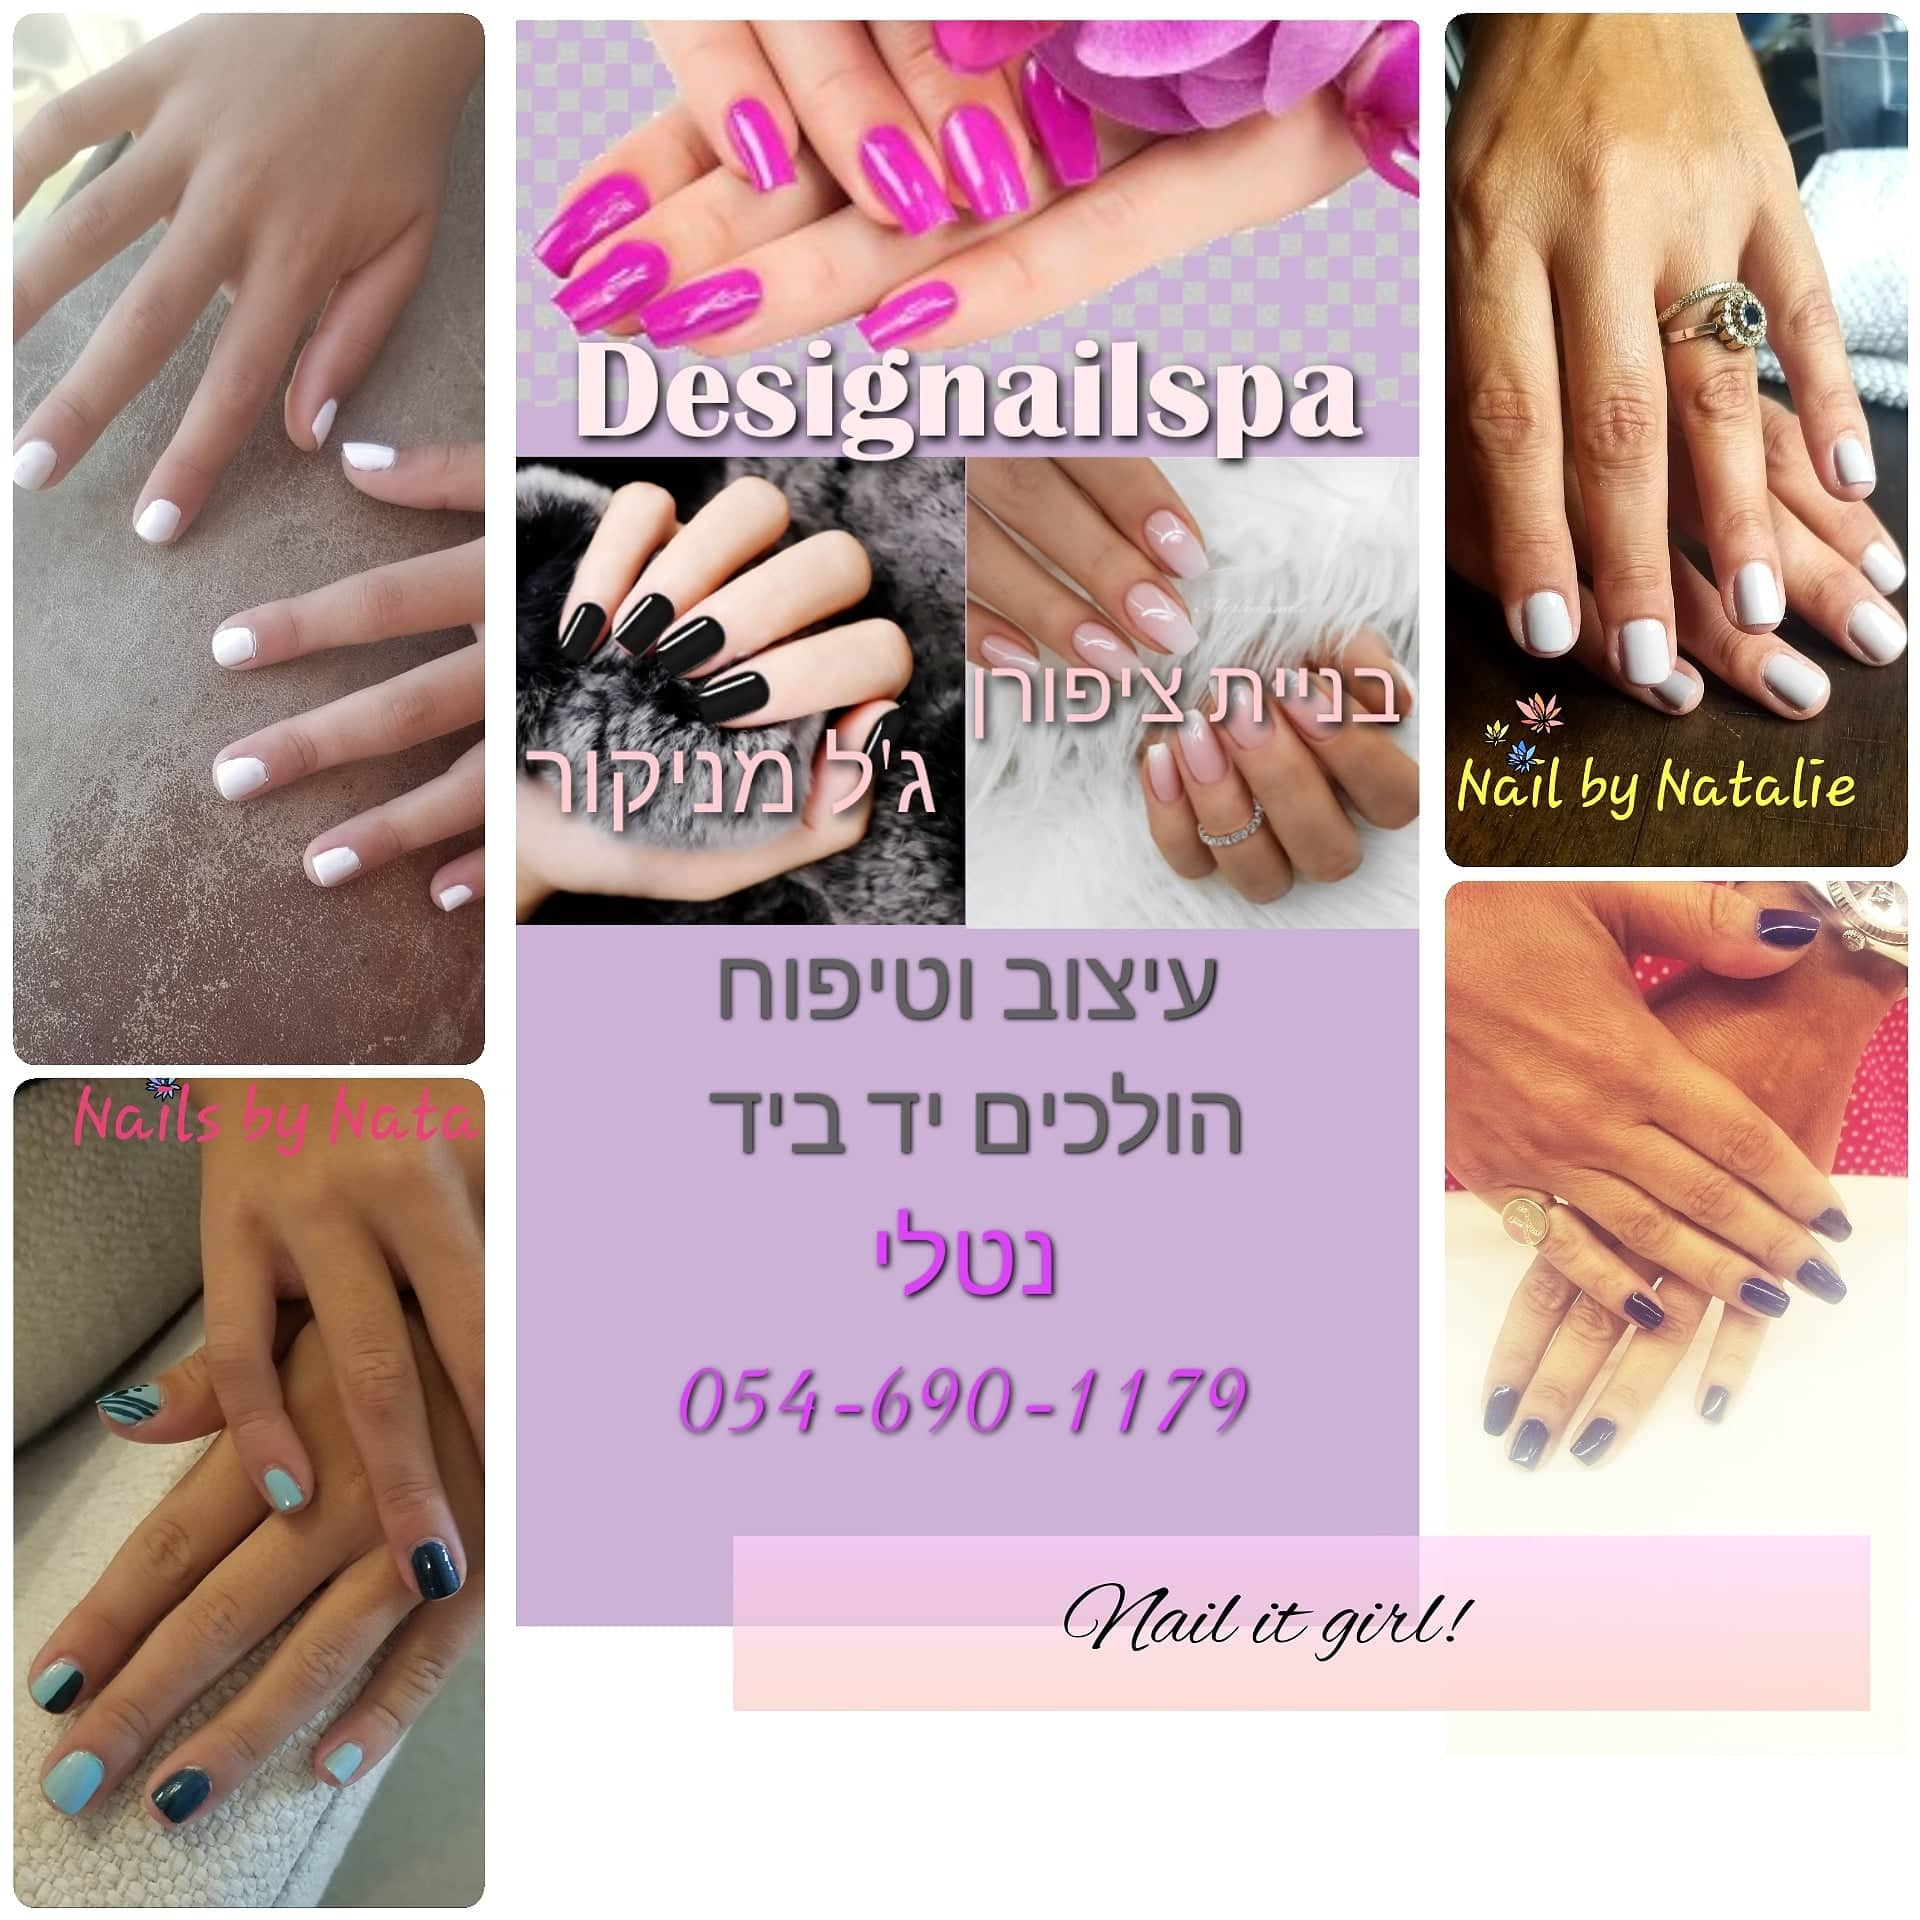 @designailspa